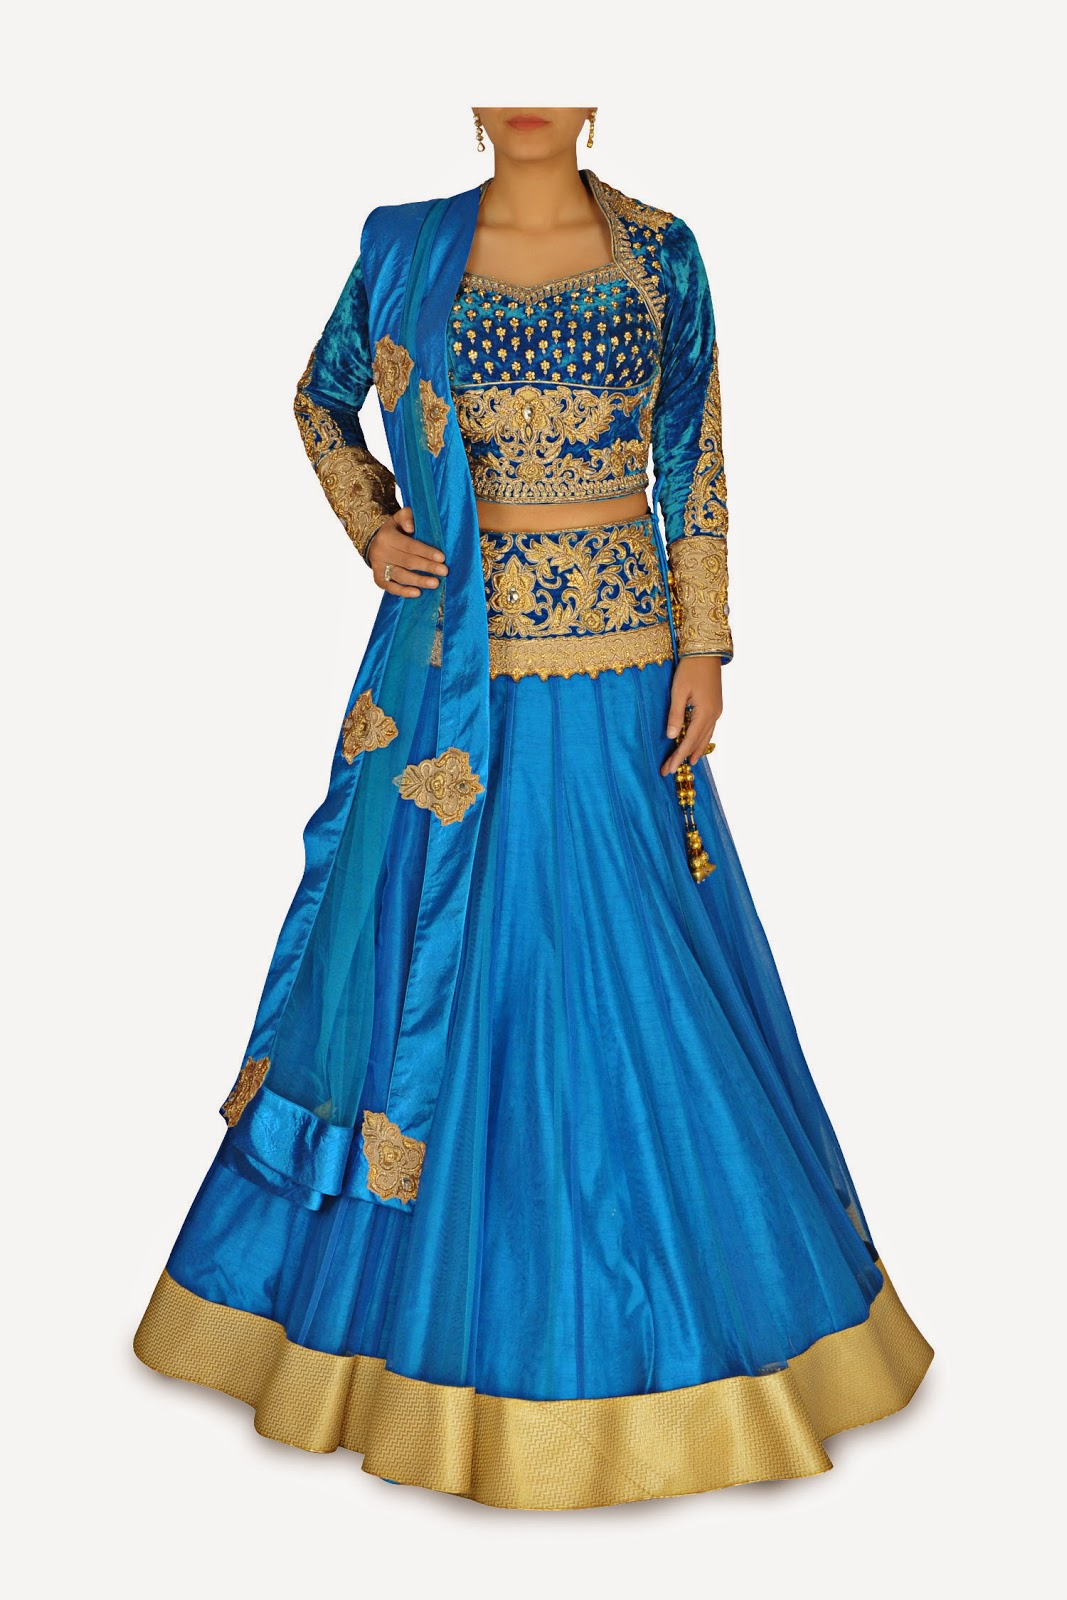 Elegant Indian Clothing & Wedding Outfits: Trendy Indian Wedding ...